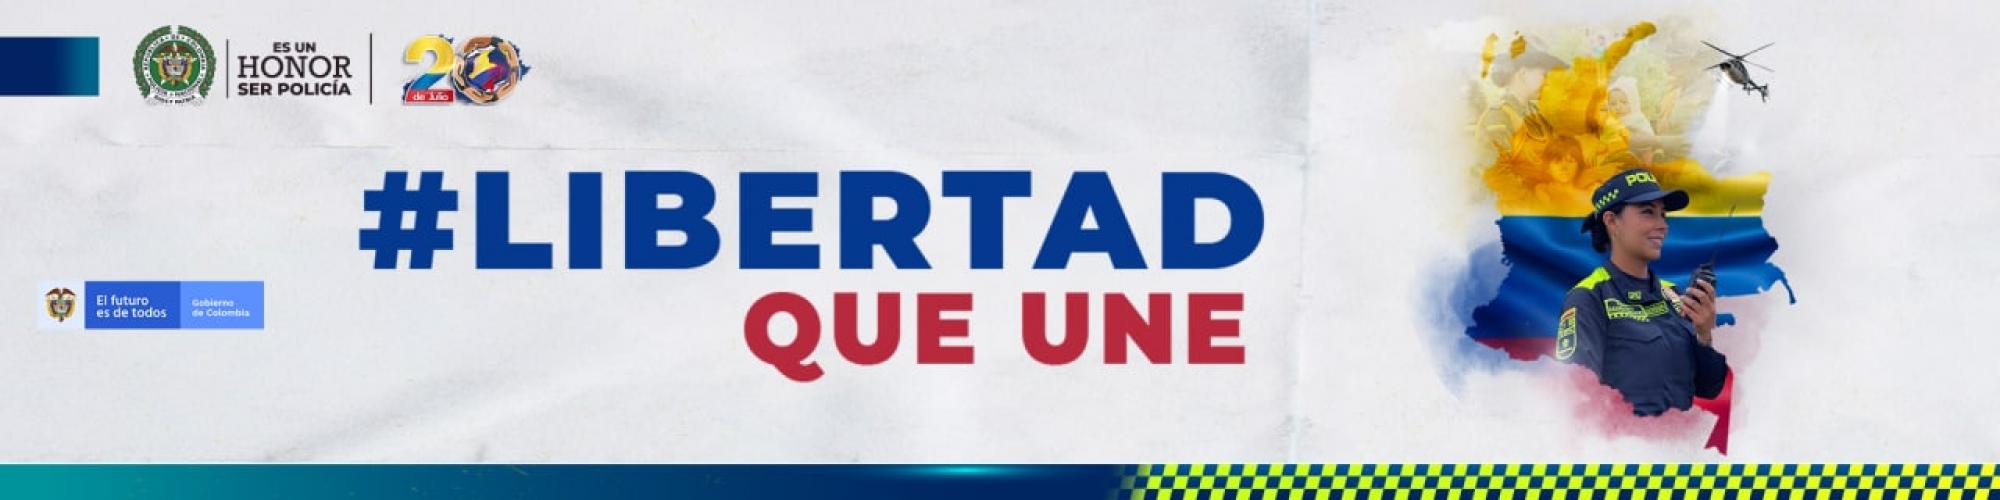 Policía-Metropolitana-de-Cartagena